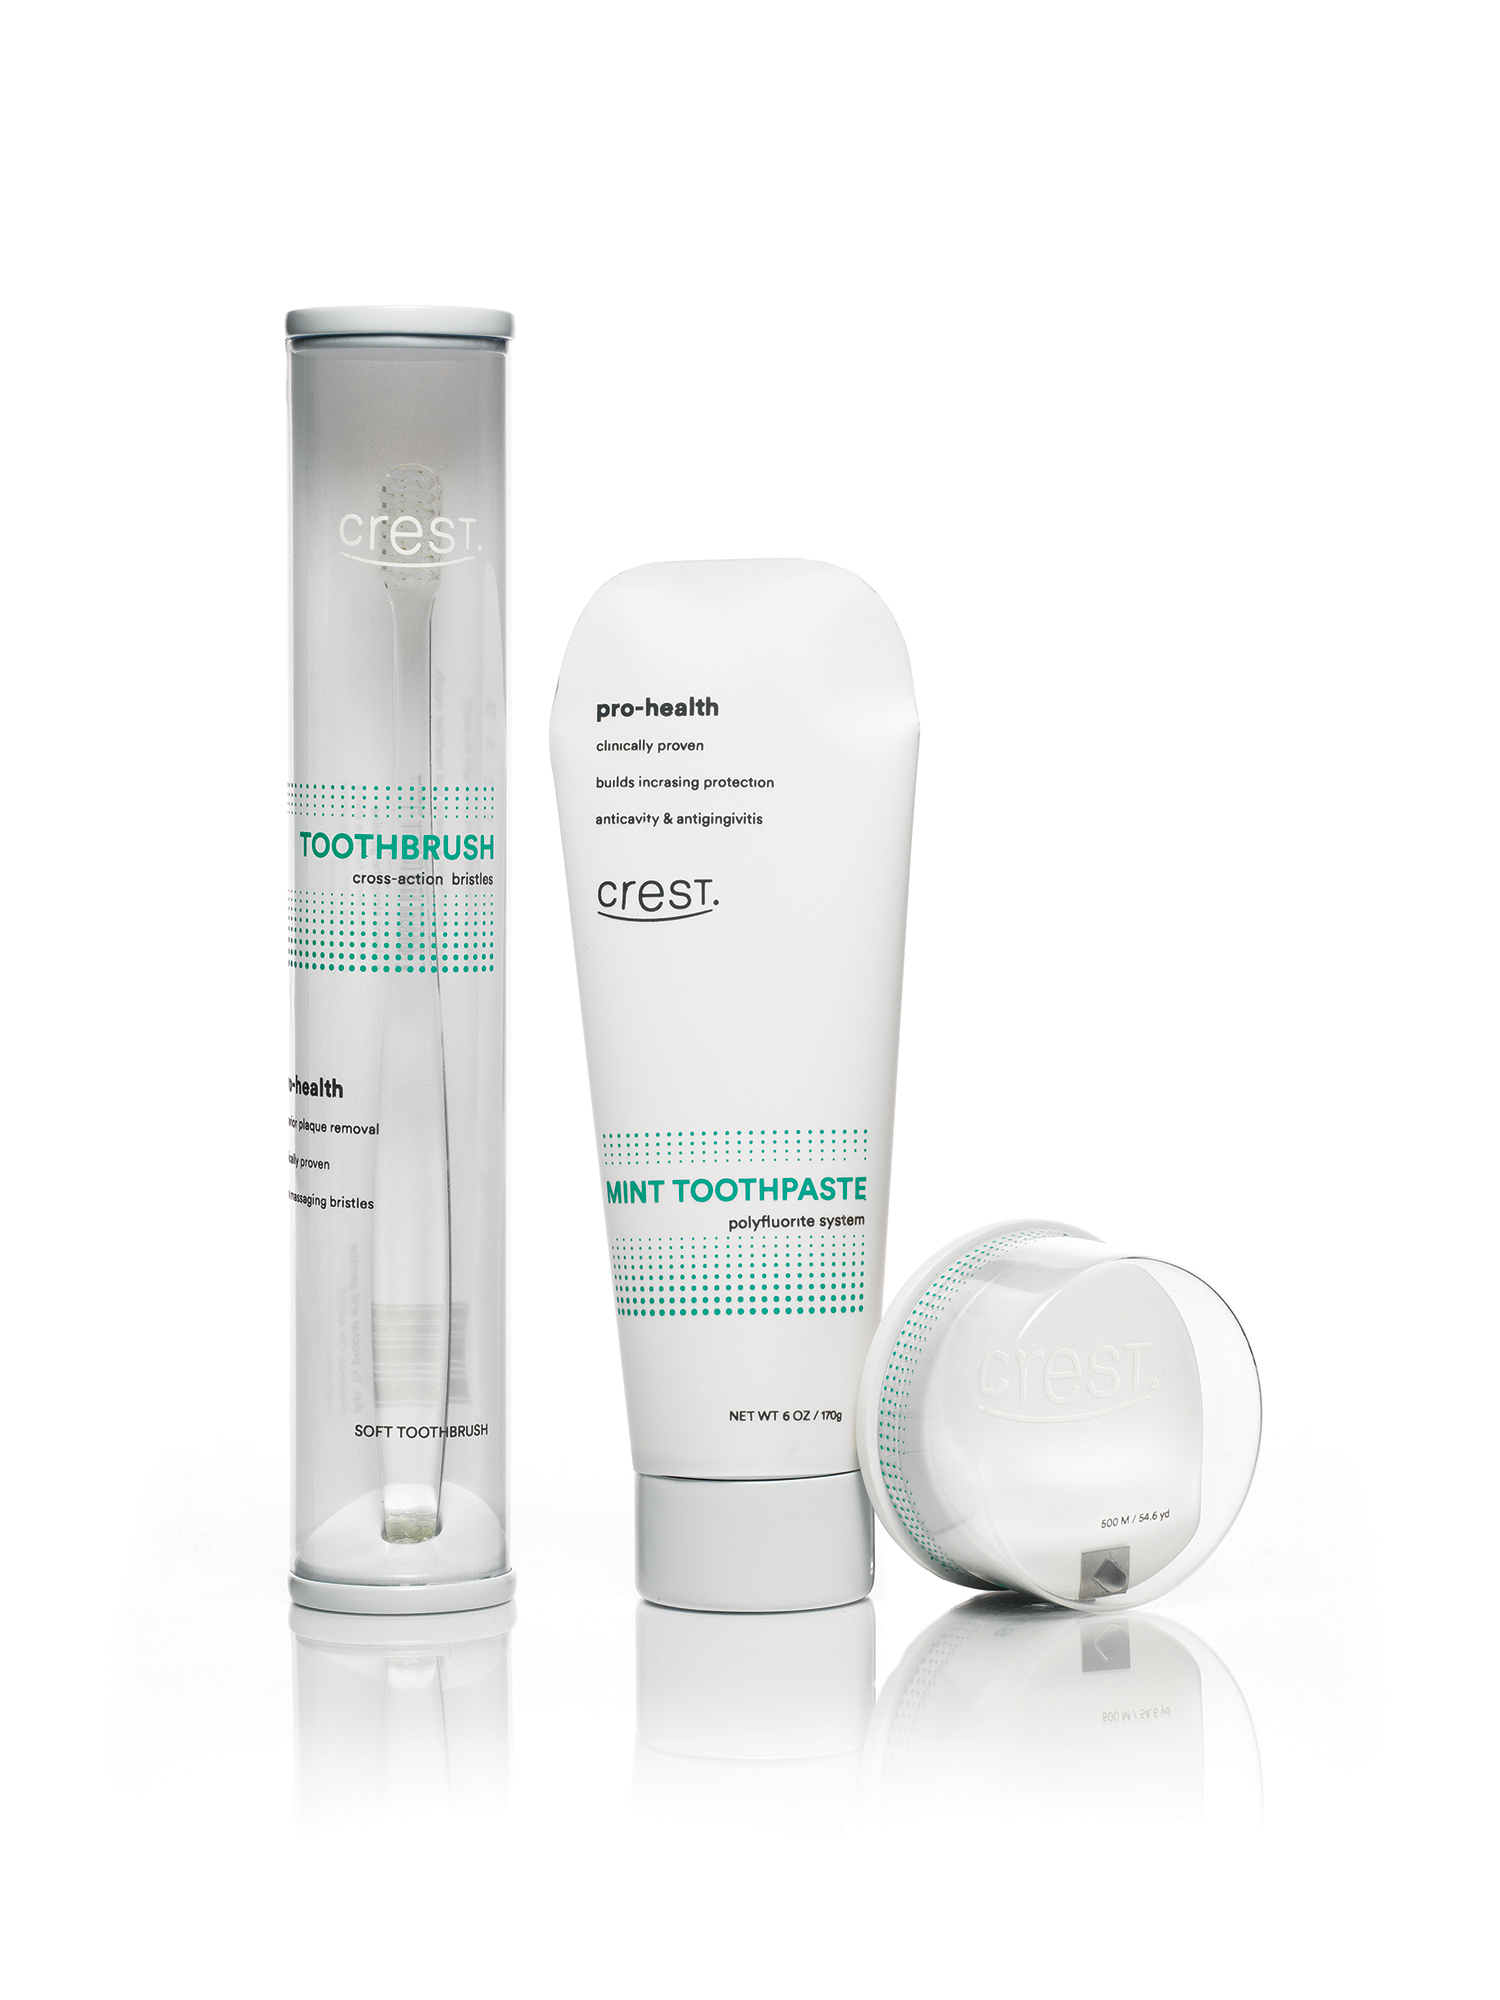 Dental-products-packaging-design-1.jpg